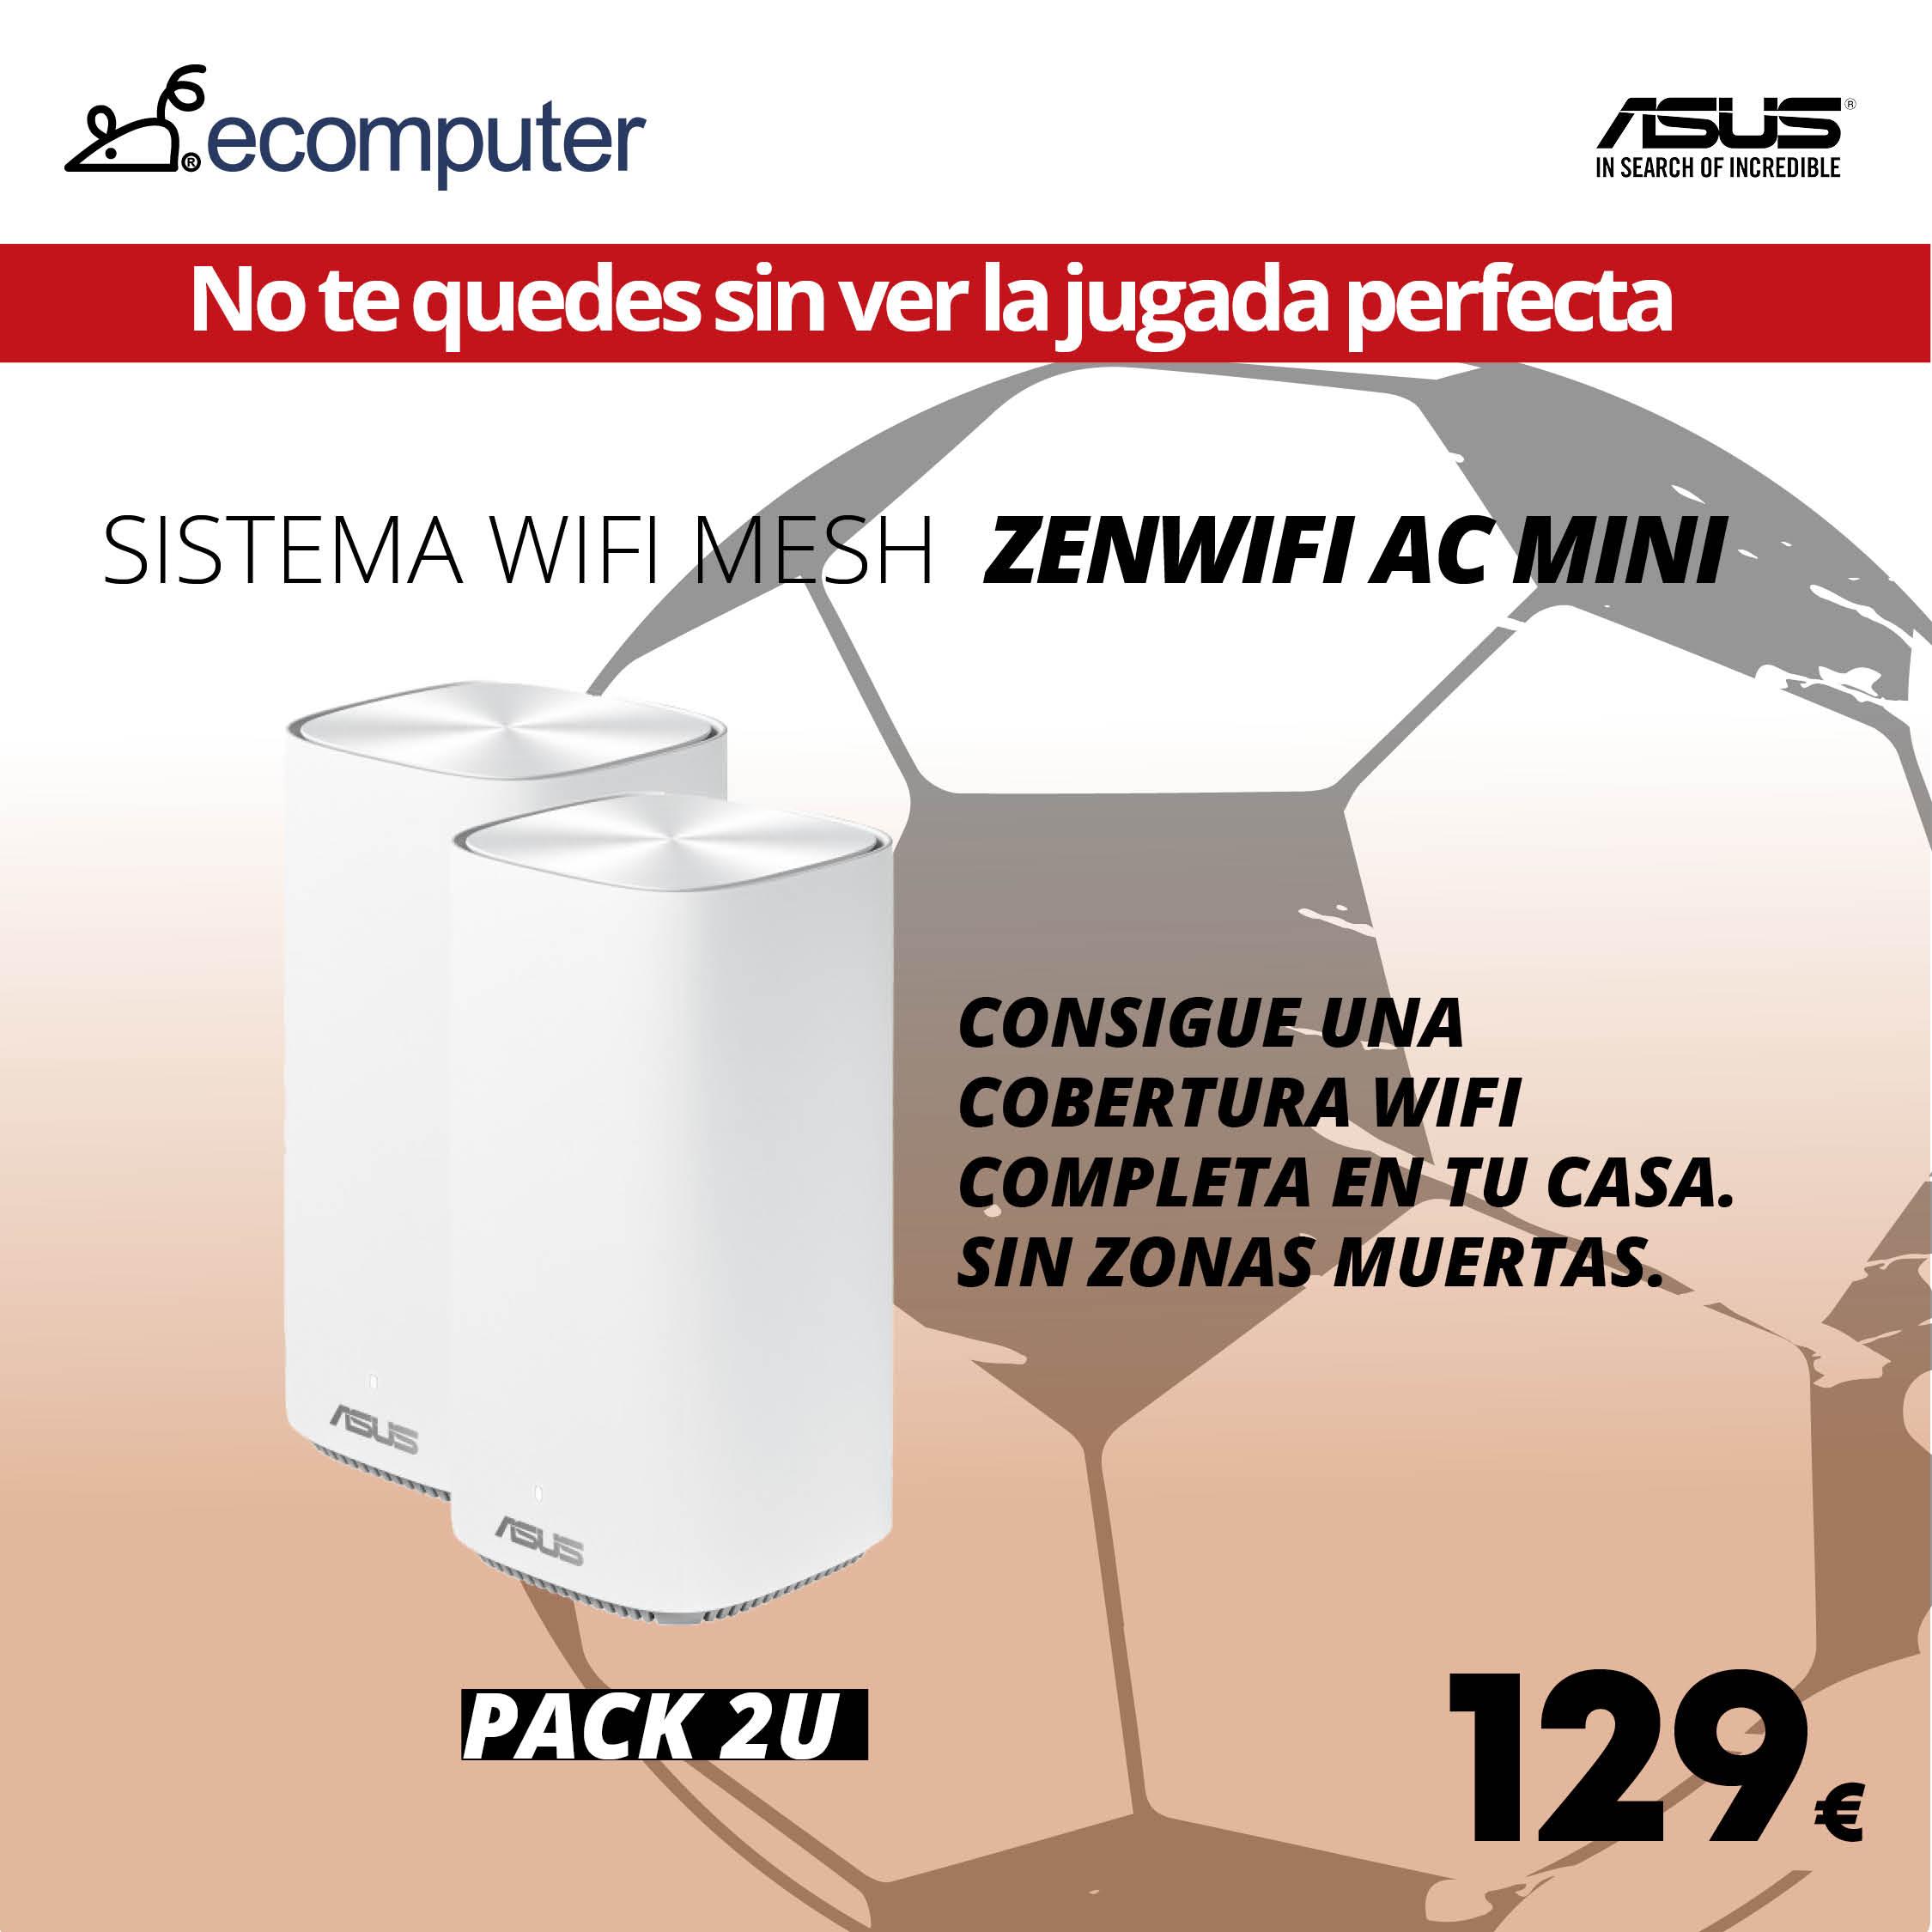 Sistema Wifi Mesh Zenwifi AC mini de Asus